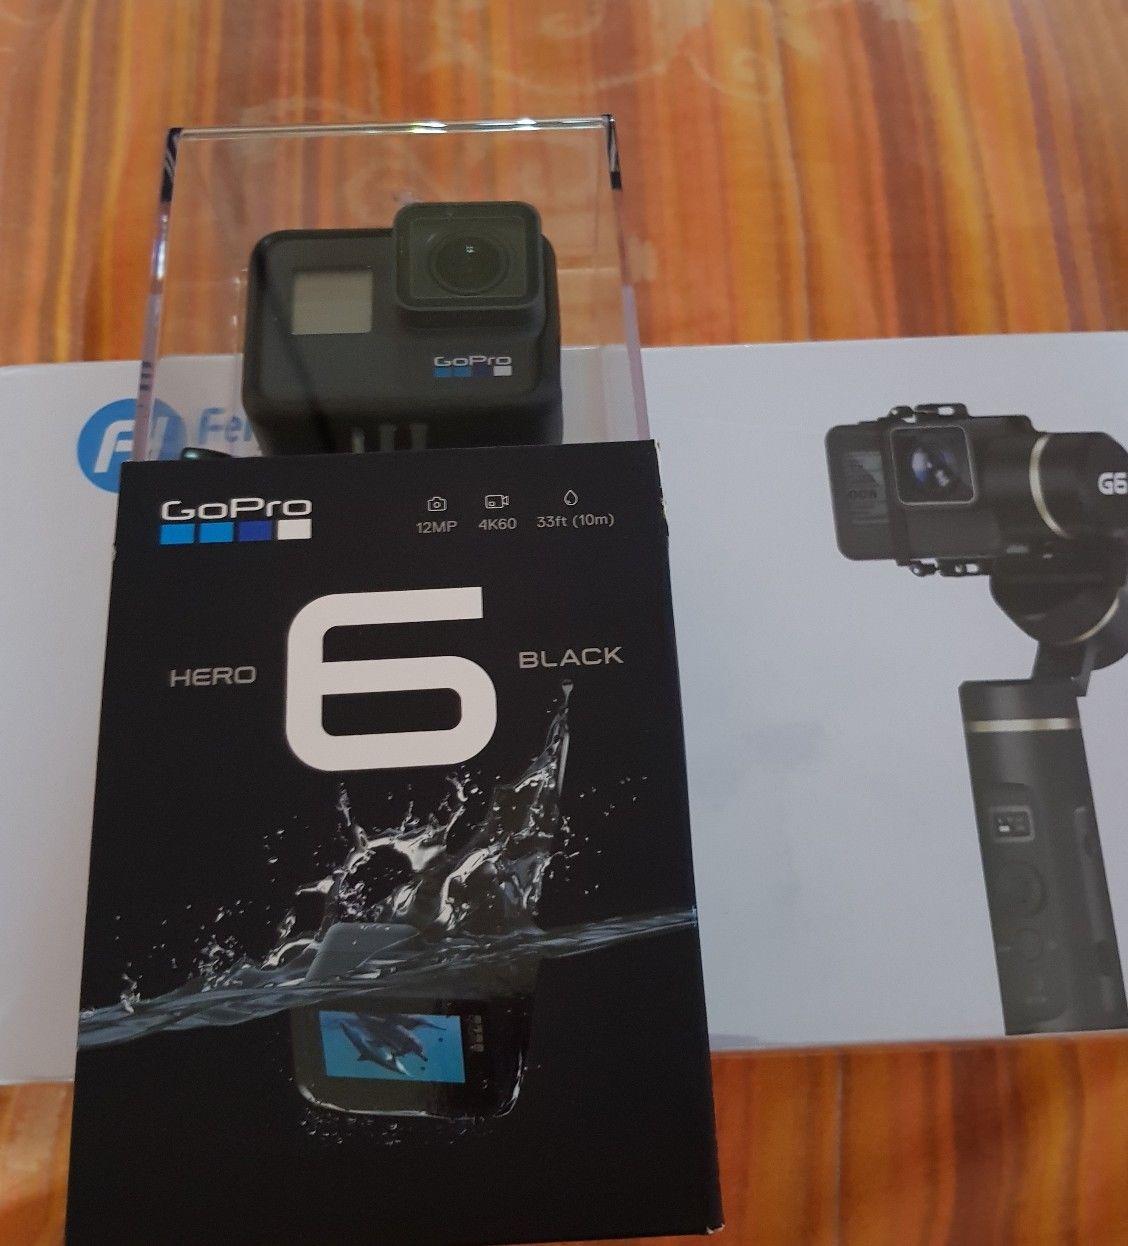 GoPro Karma Drone with Hero 6 Black